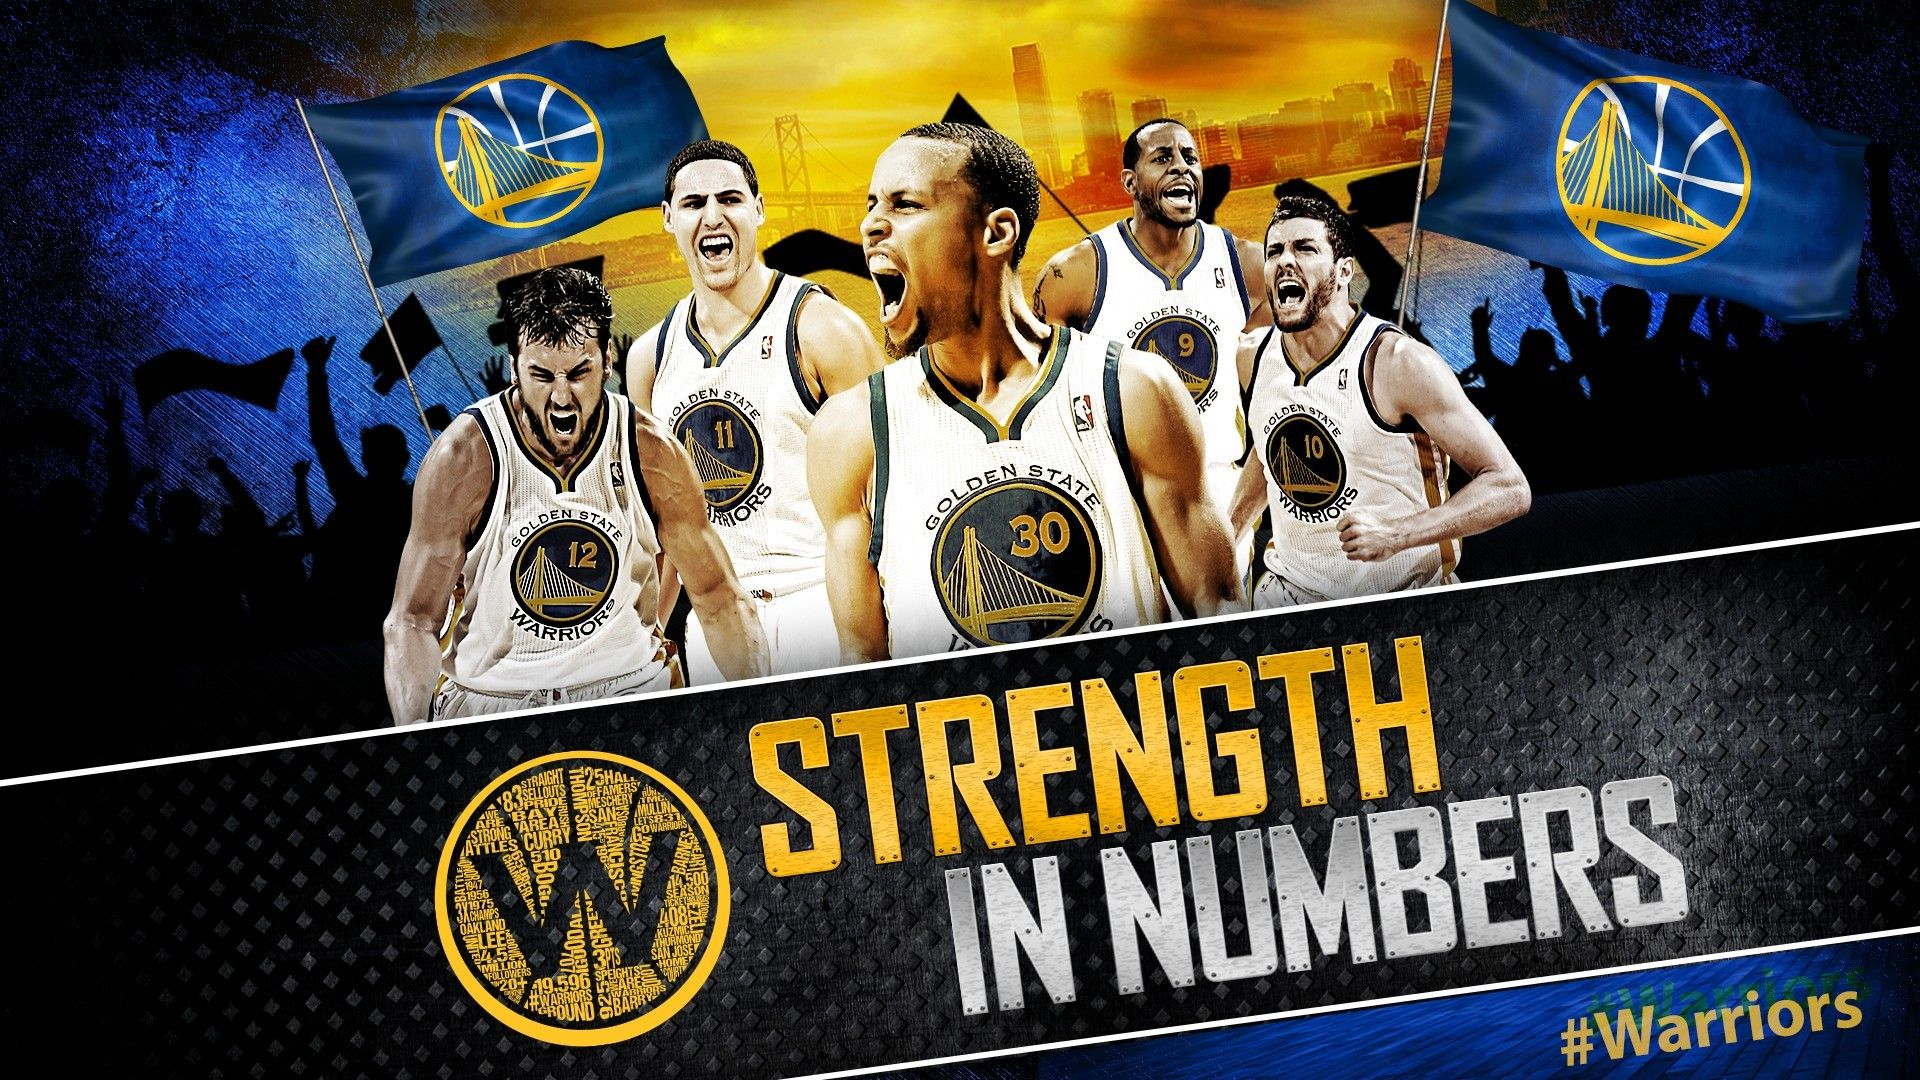 Hd Backgrounds Golden State Warriors Basketball Wallpapers